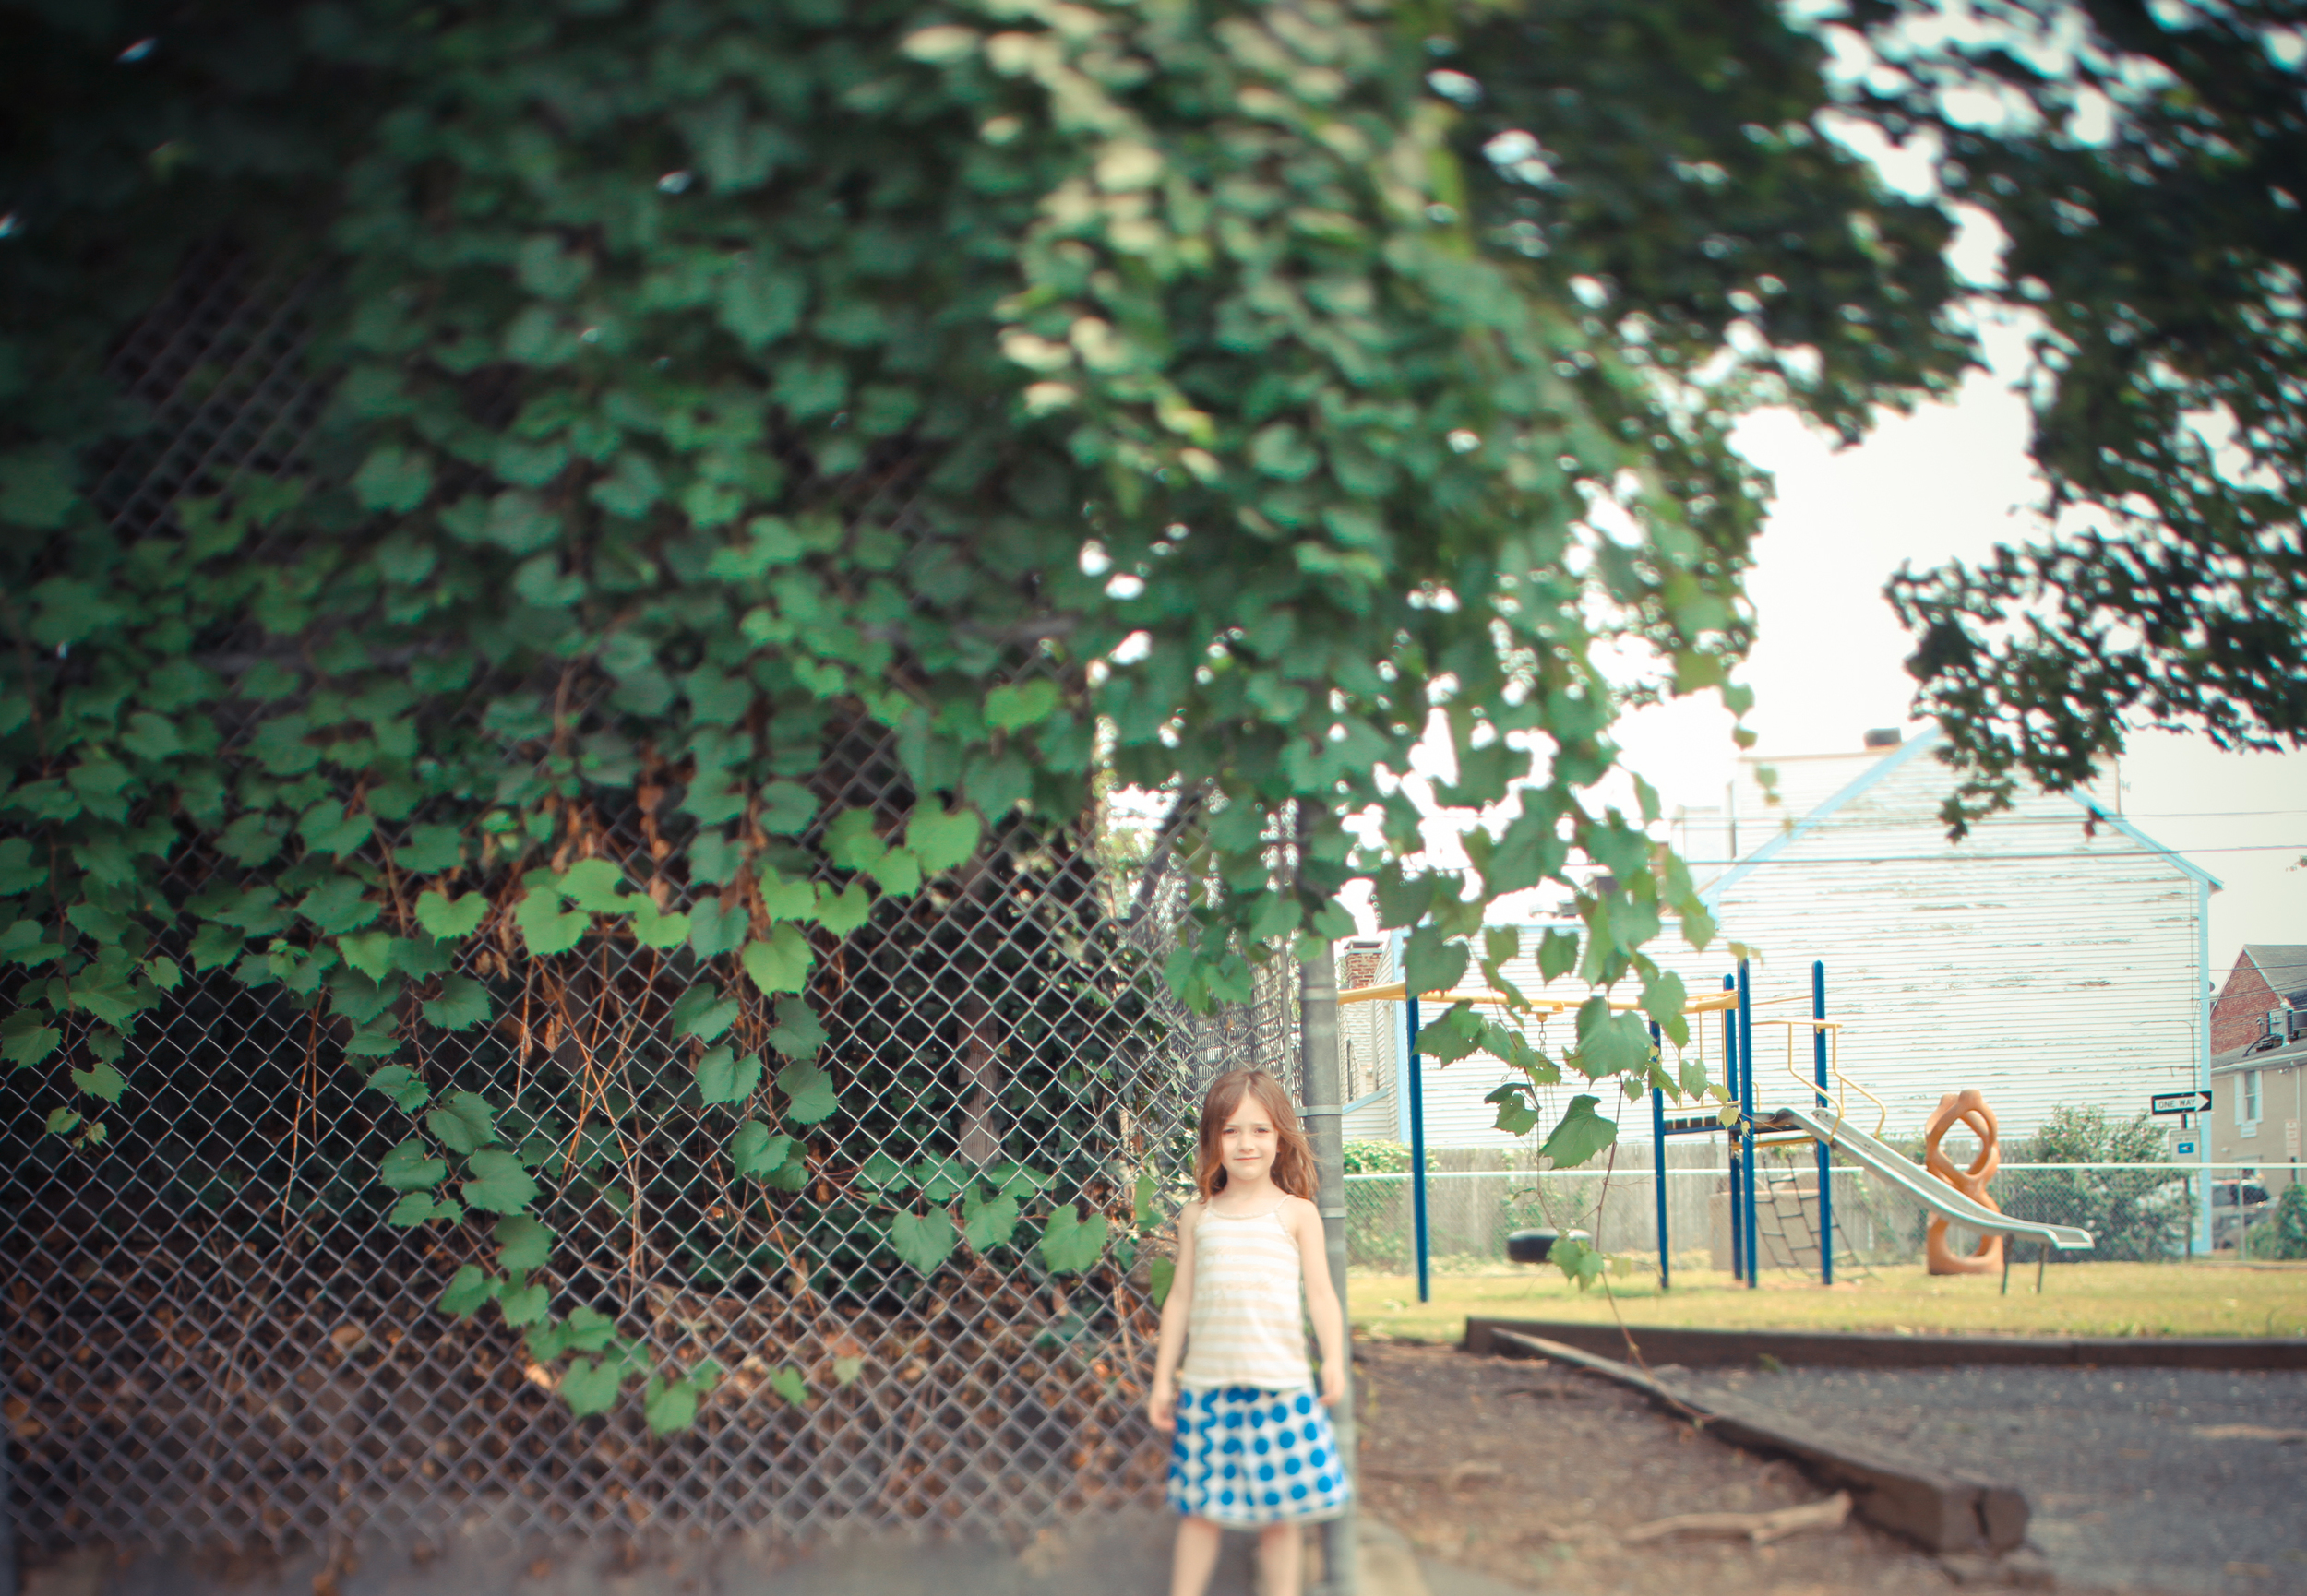 Audrey_Park_IMG_0116.jpg